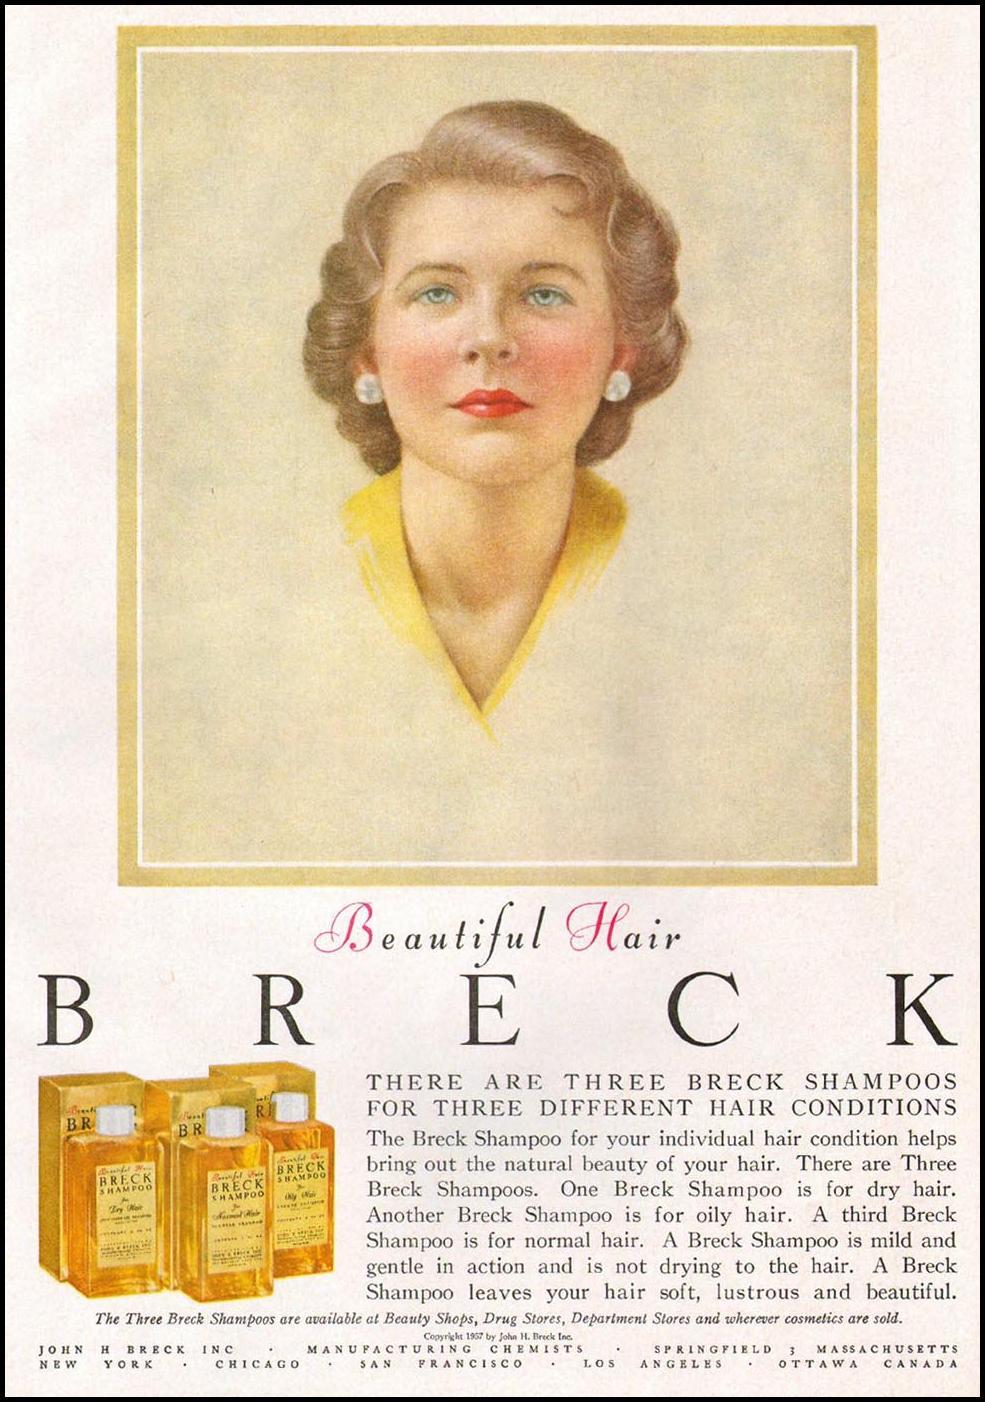 BRECK SHAMPOO GOOD HOUSEKEEPING 05/01/1957 p. 169